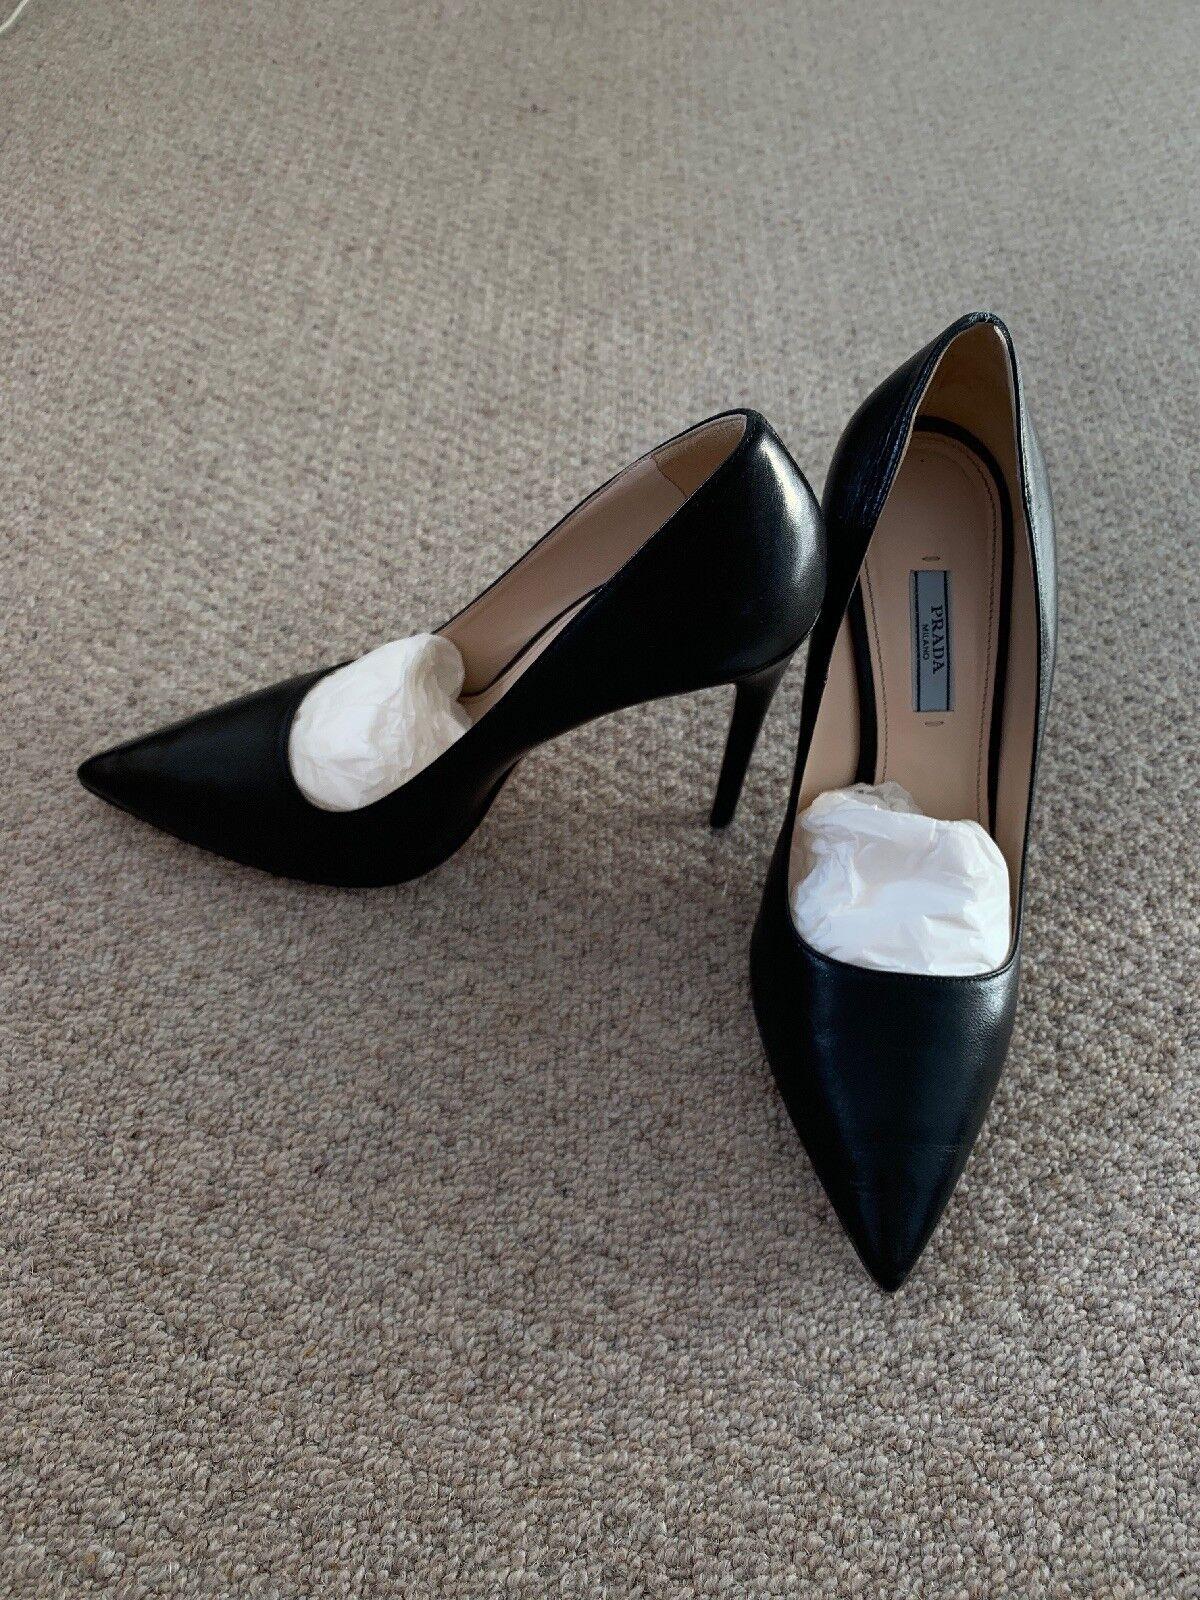 Gorgeous Prada Heels - Barely Worn